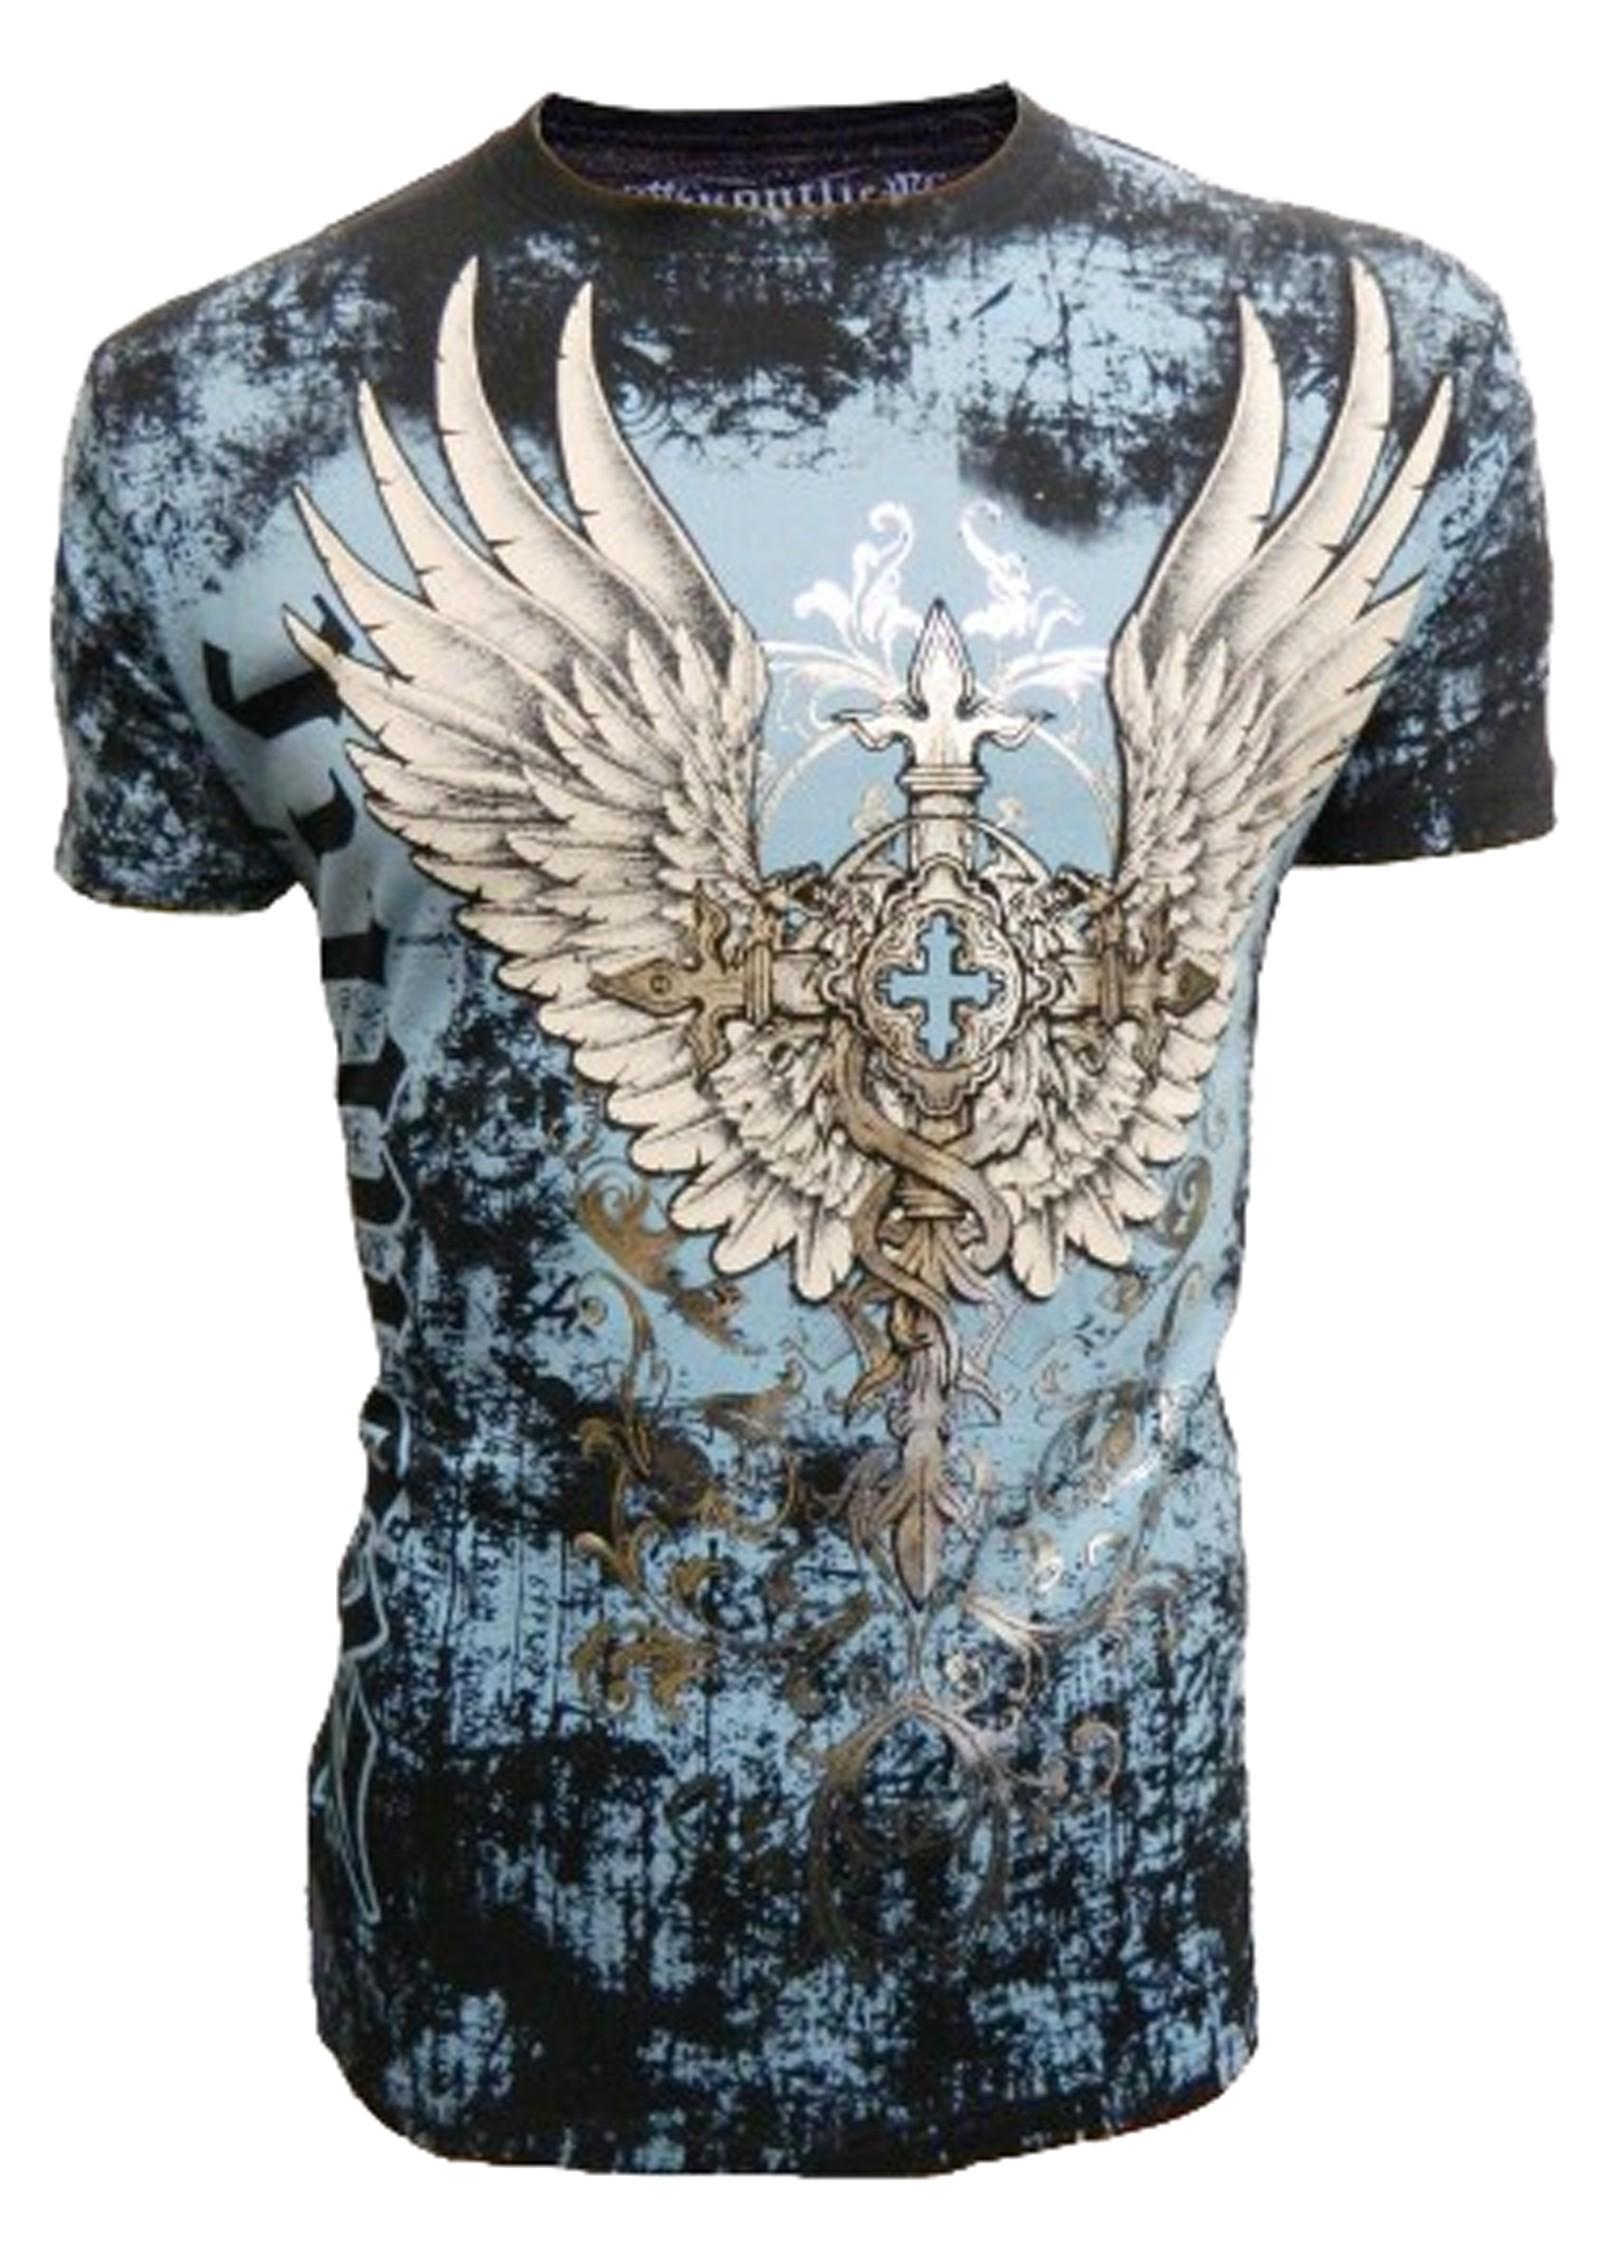 Konflic Clothing - Revenge is Sweet T-Shirt